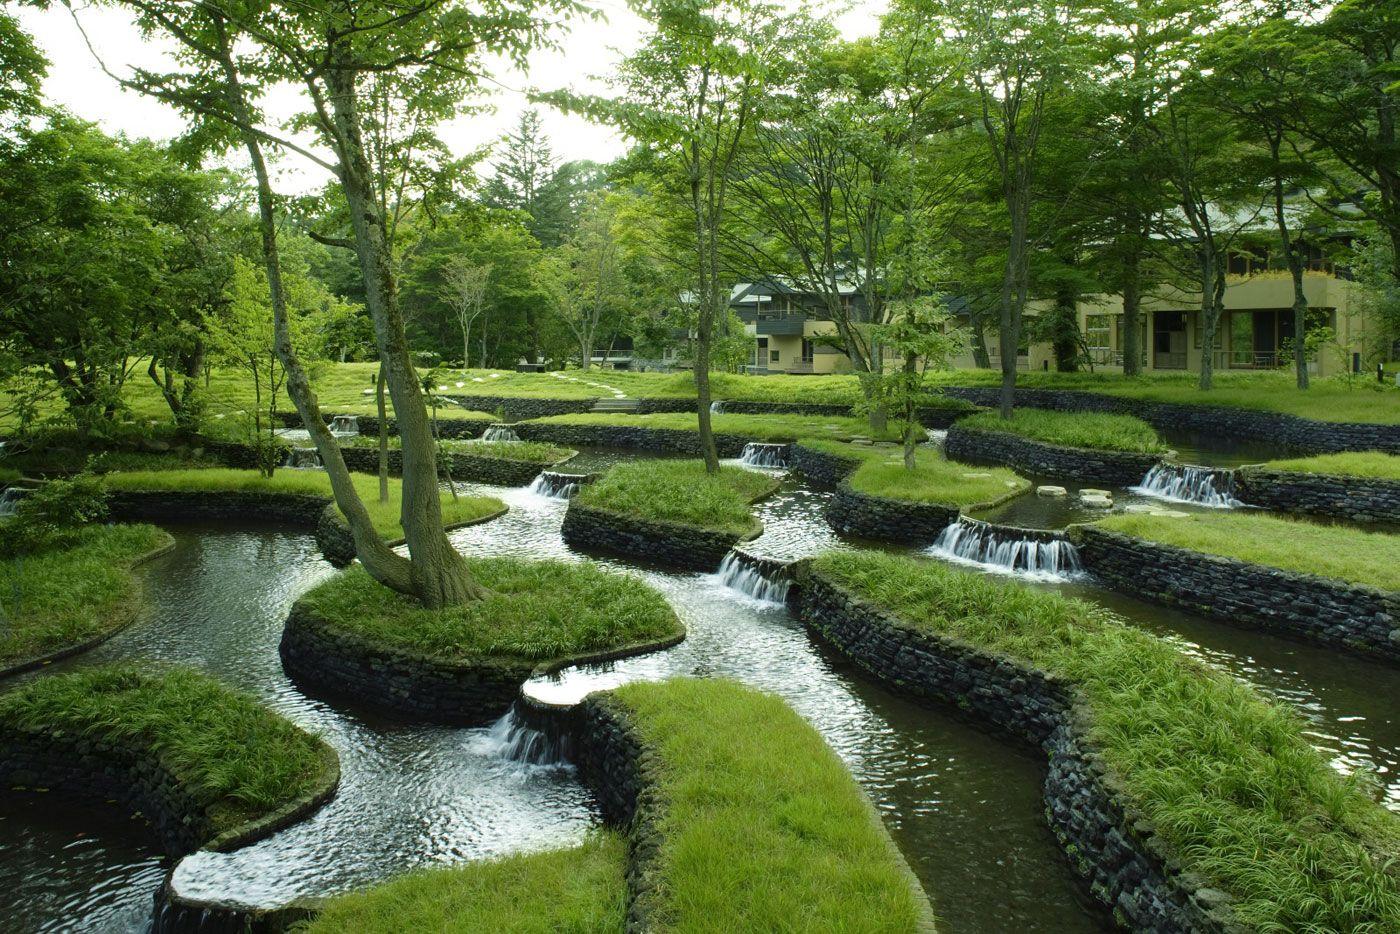 Natural garden landscape  HoshinoyaKaruizawainJapan  garden  Pinterest  Karuizawa